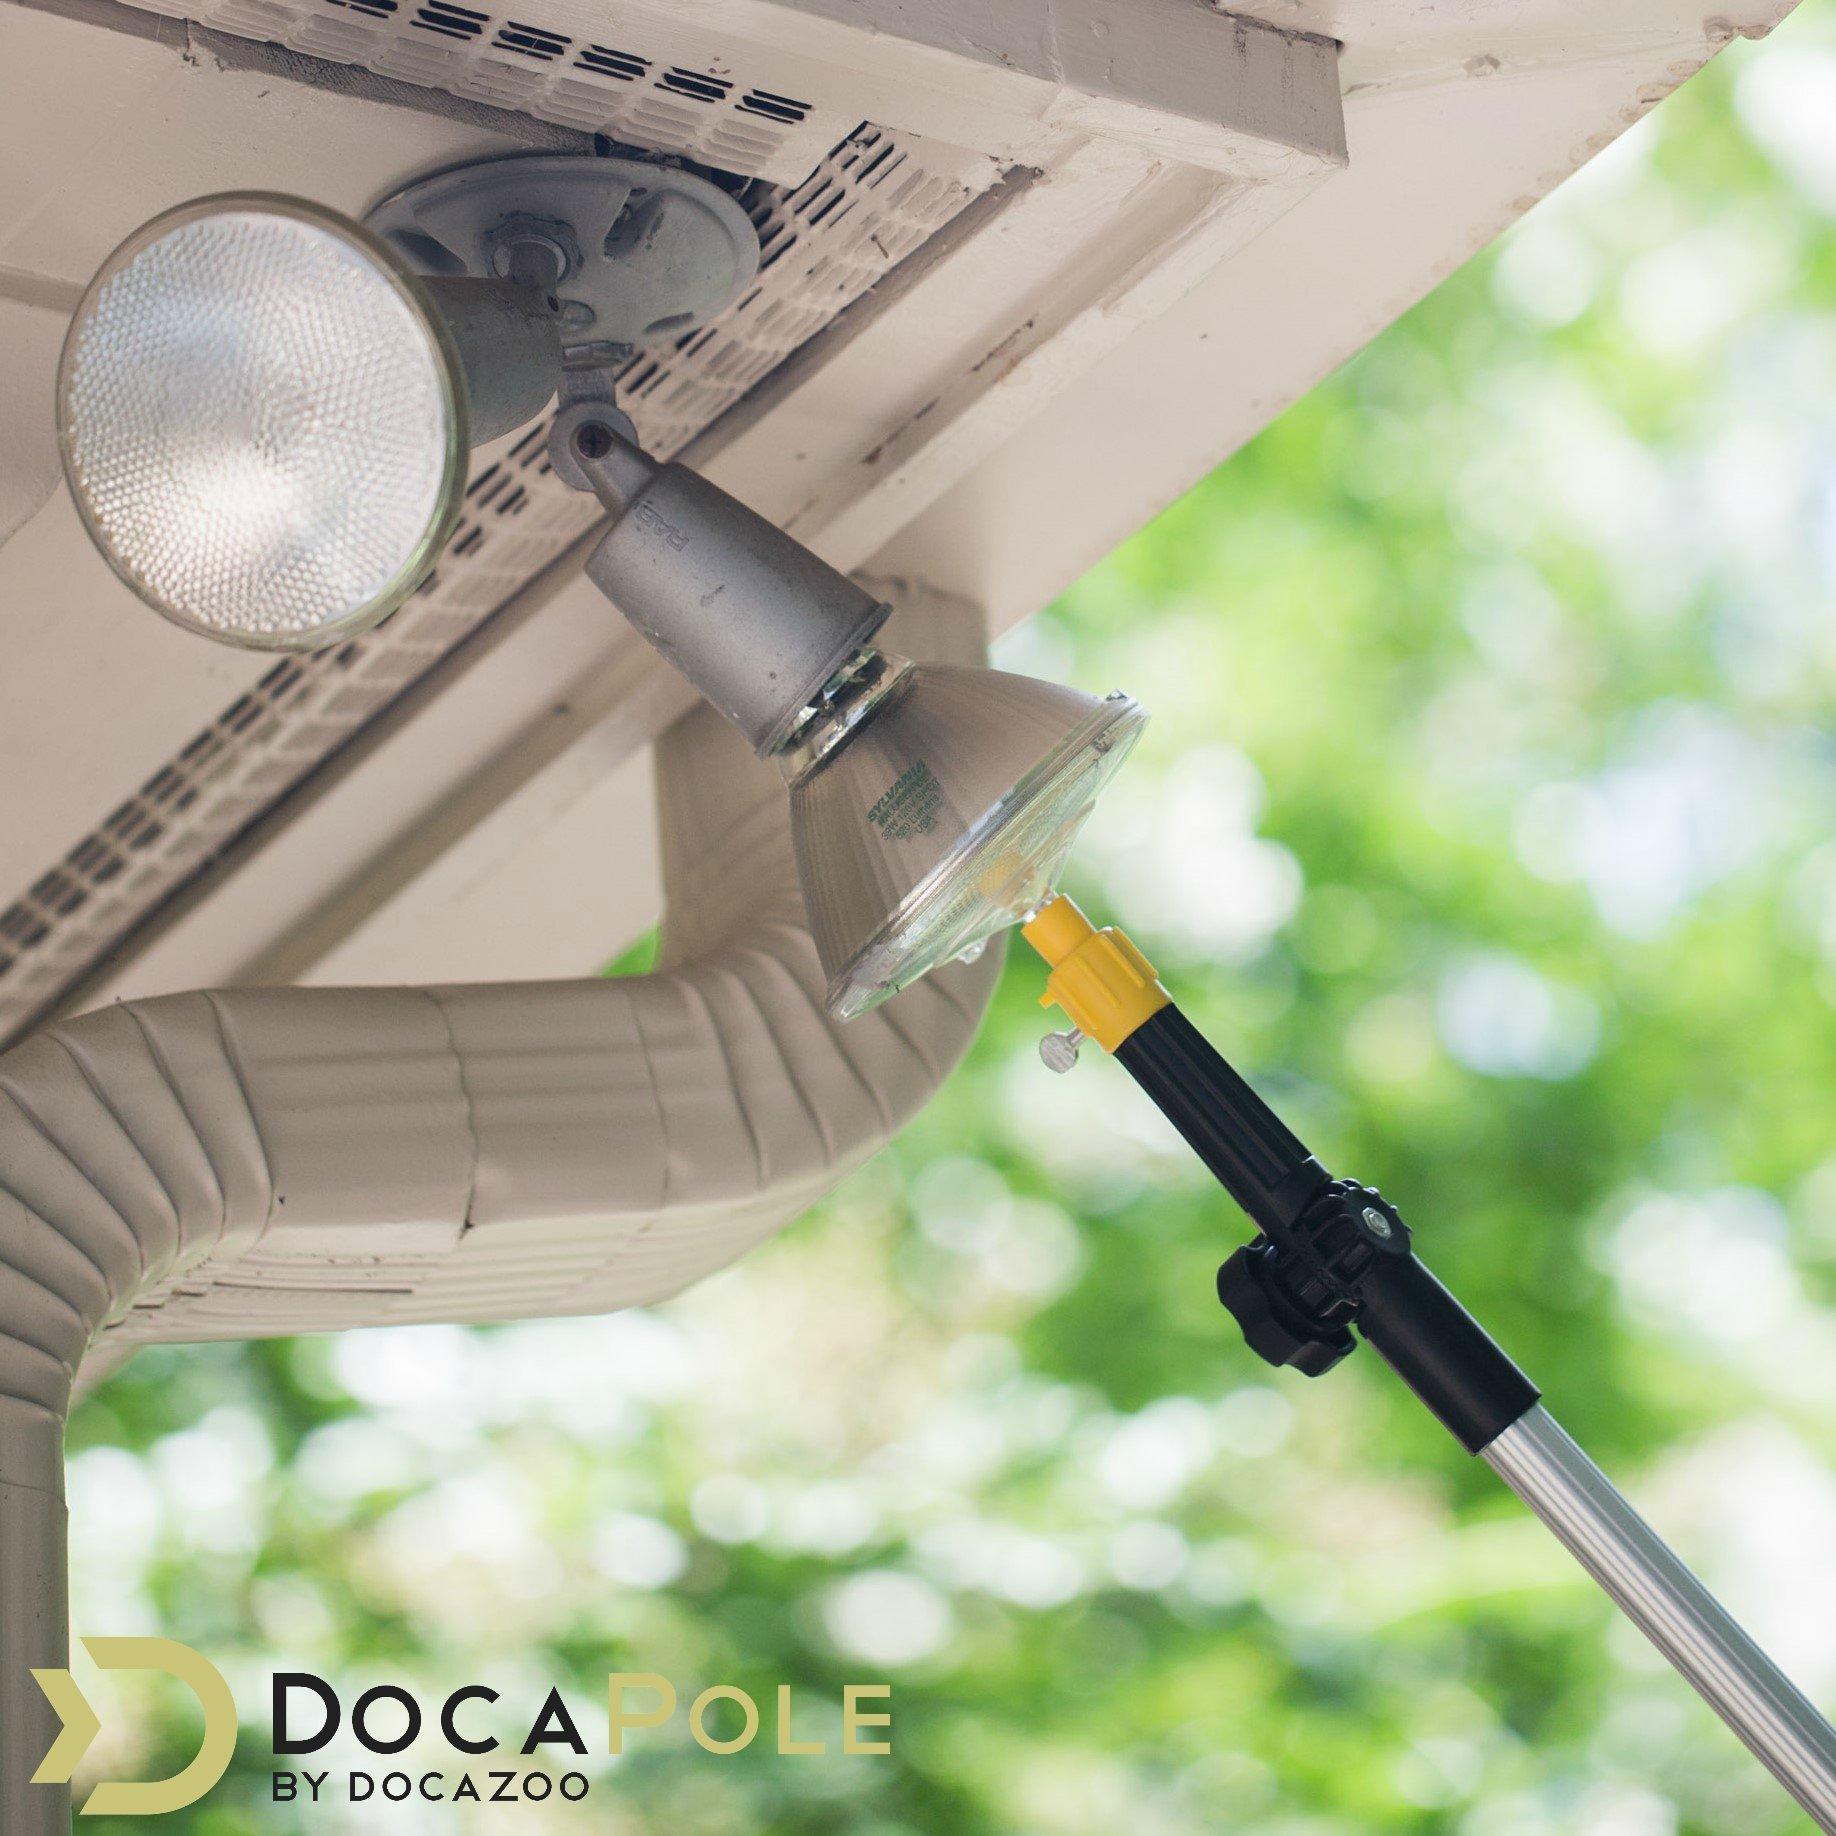 Docapole 6 24 Foot Extension Pole Multi Purpose